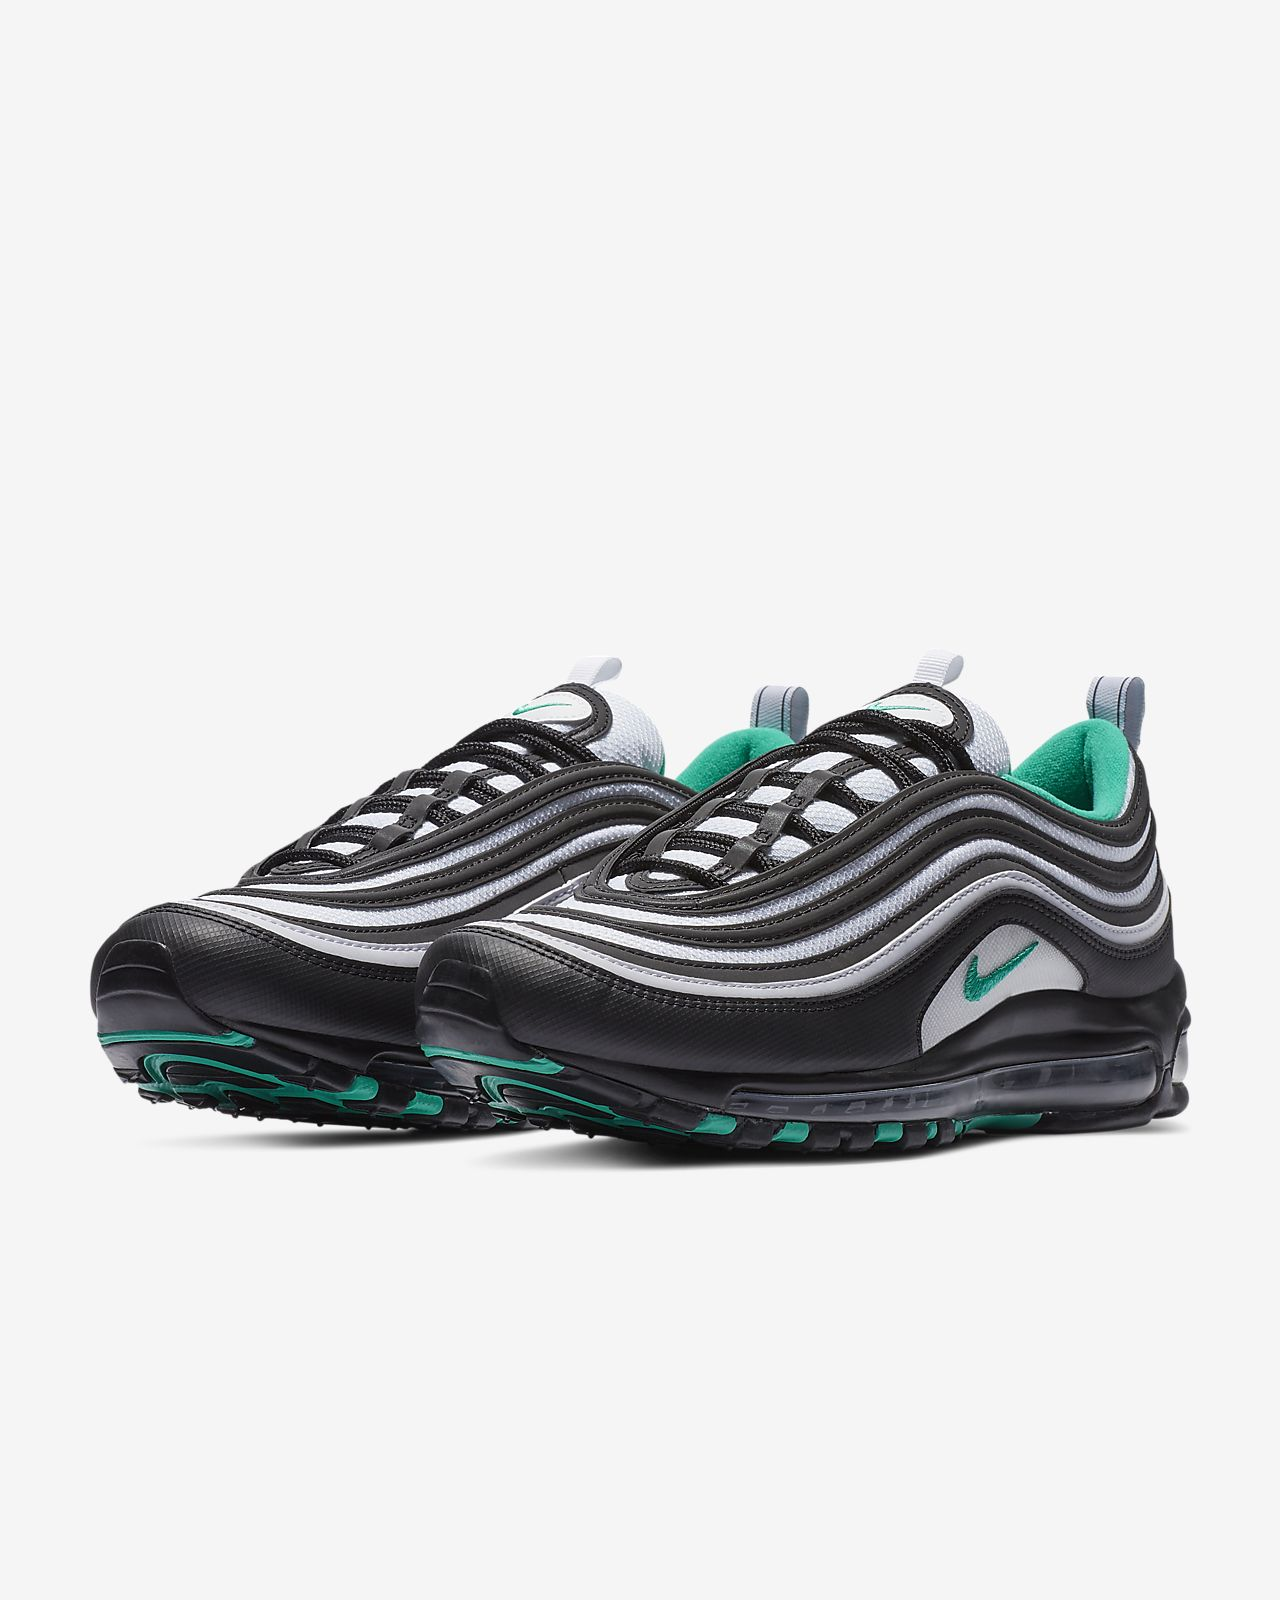 the latest 078aa 4cea2 Men s Shoe. Nike Air Max 97